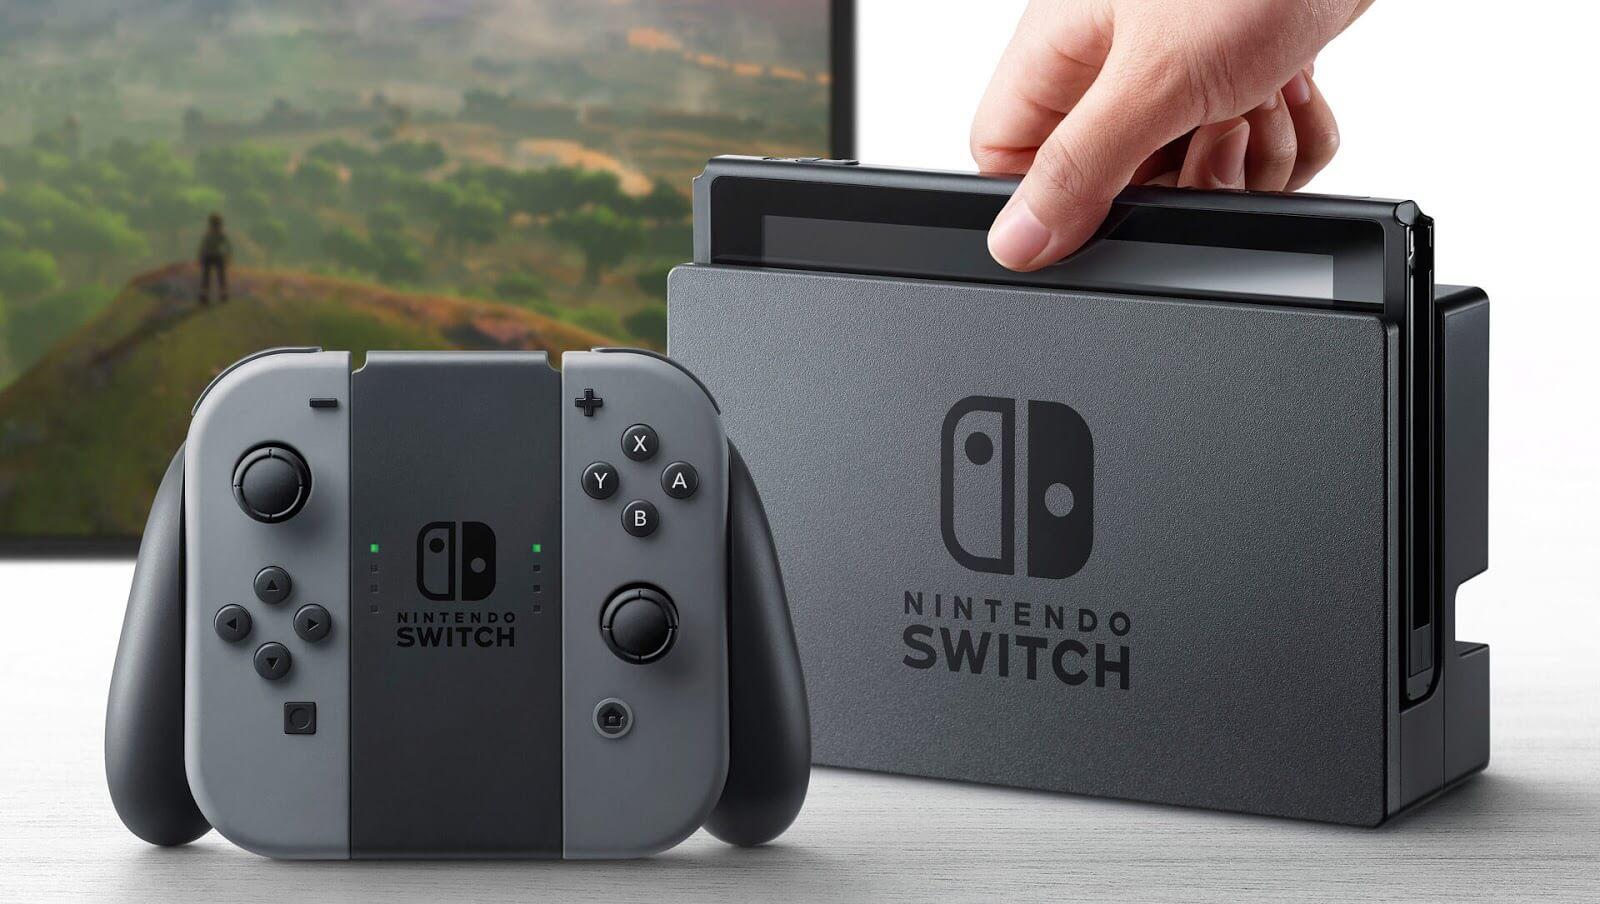 5 Hal Menarik Mengenai Nintendo Switch Yang Harus Kalian Ketahui